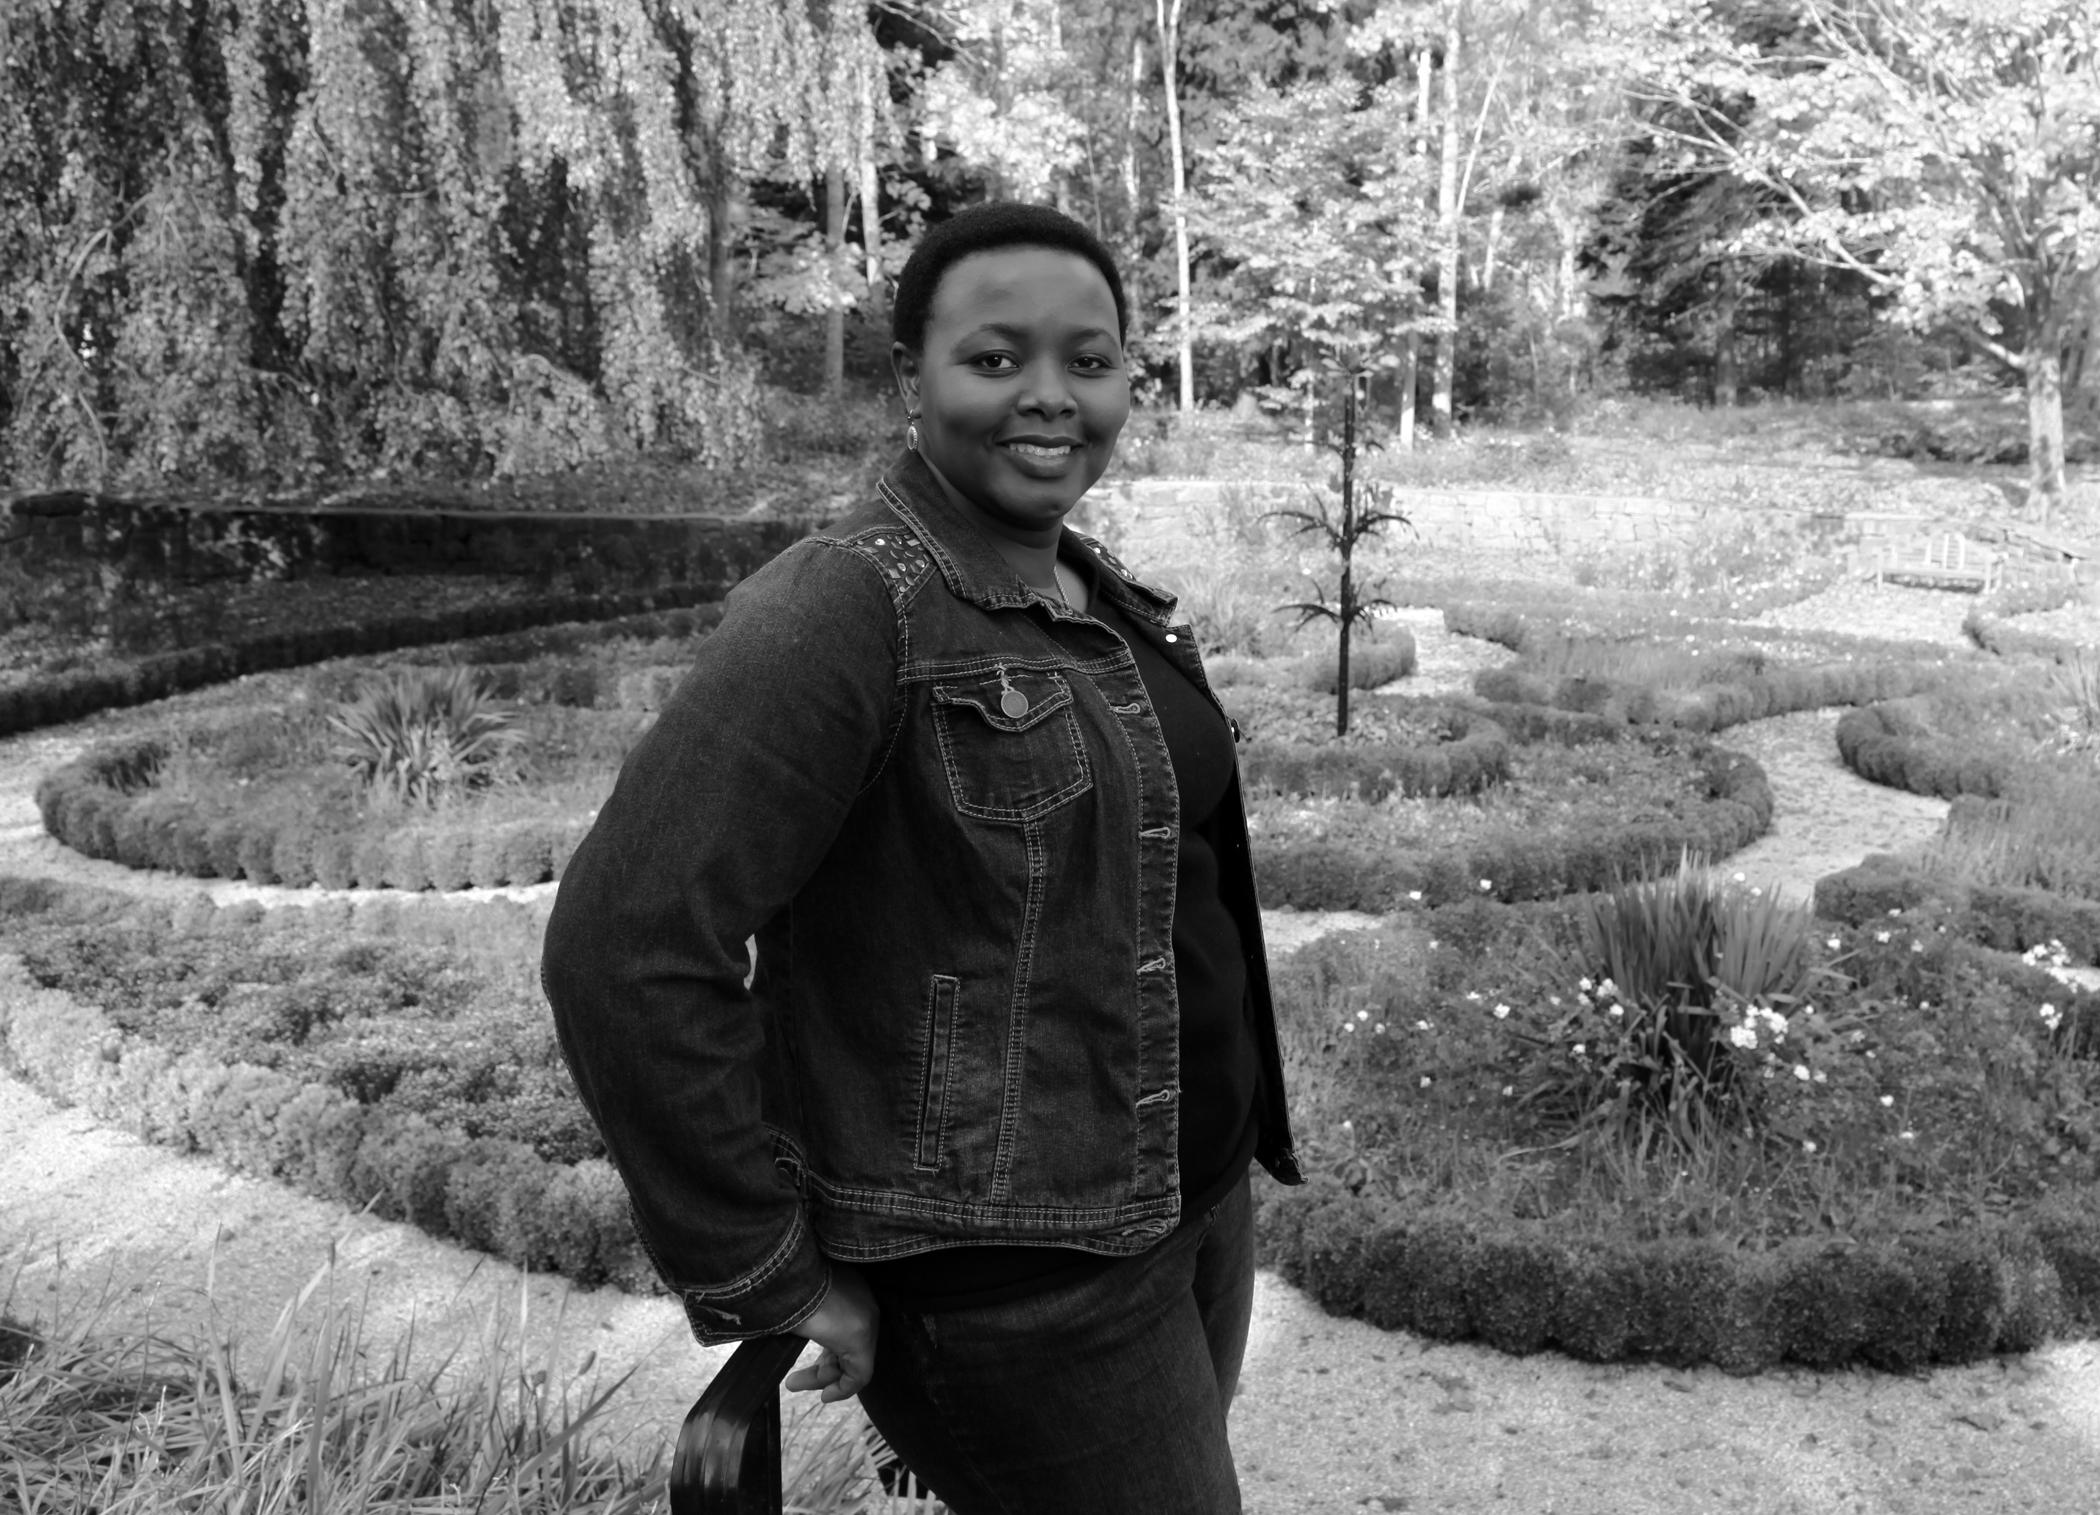 Malawi Nancy garden_8980.jpeg